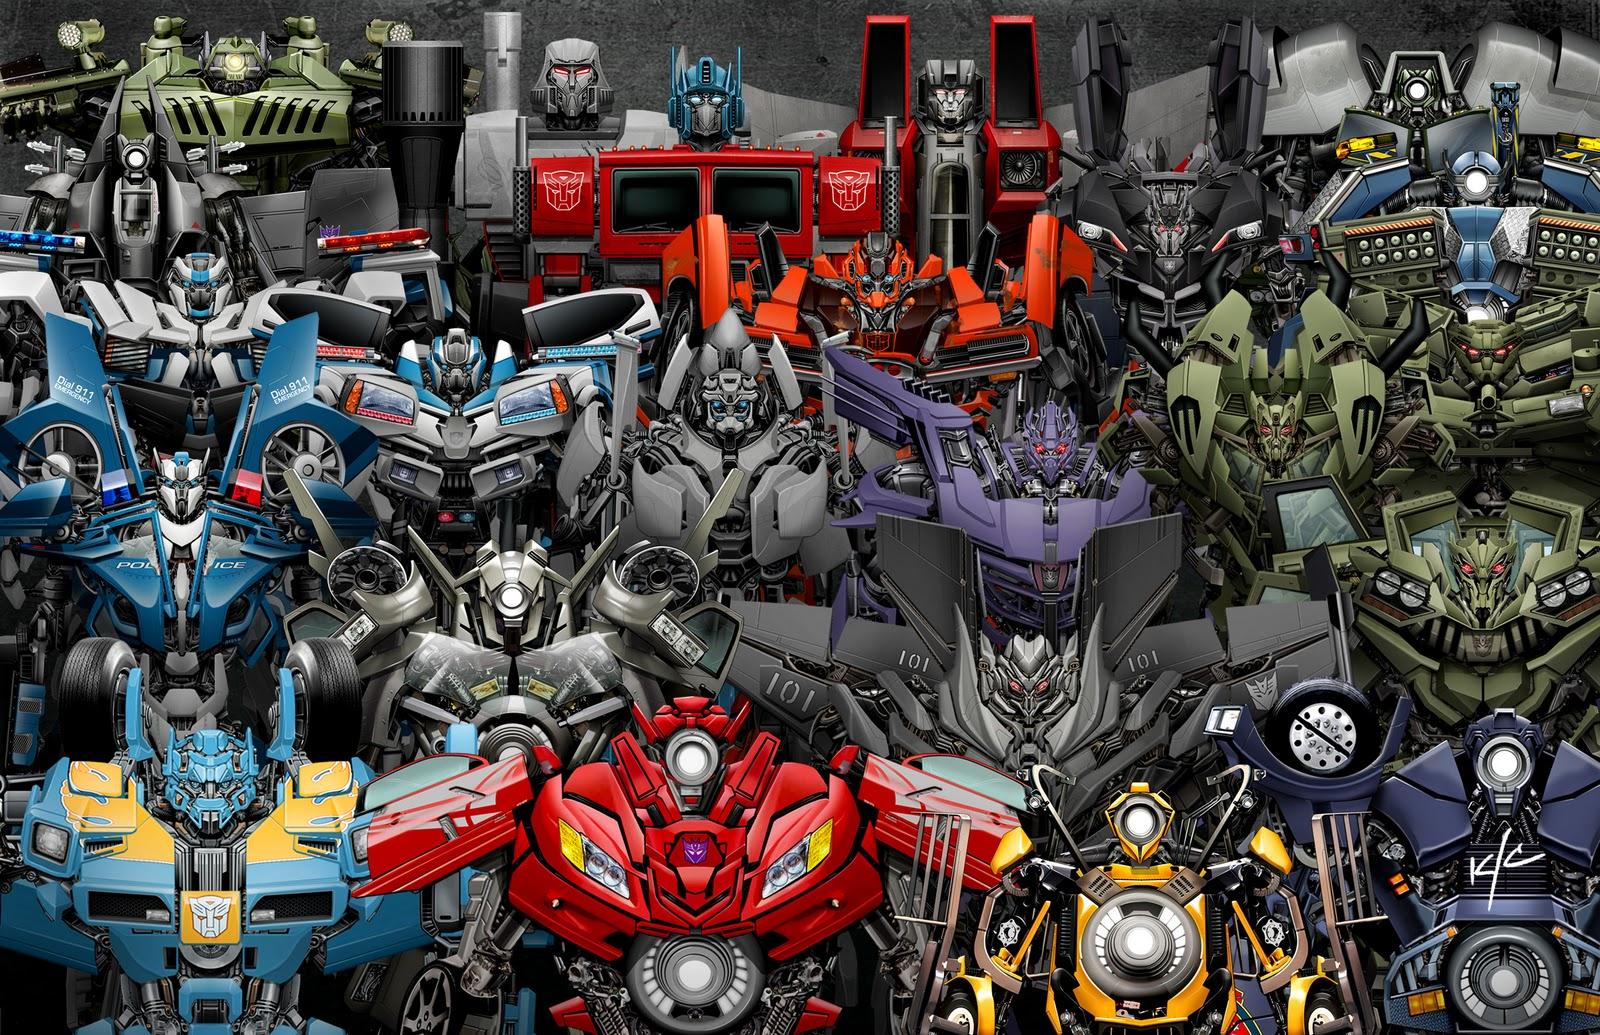 Transformers Fall Of Cybertron 4k Wallpaper Trololo Blogg Transformers 80s Wallpaper